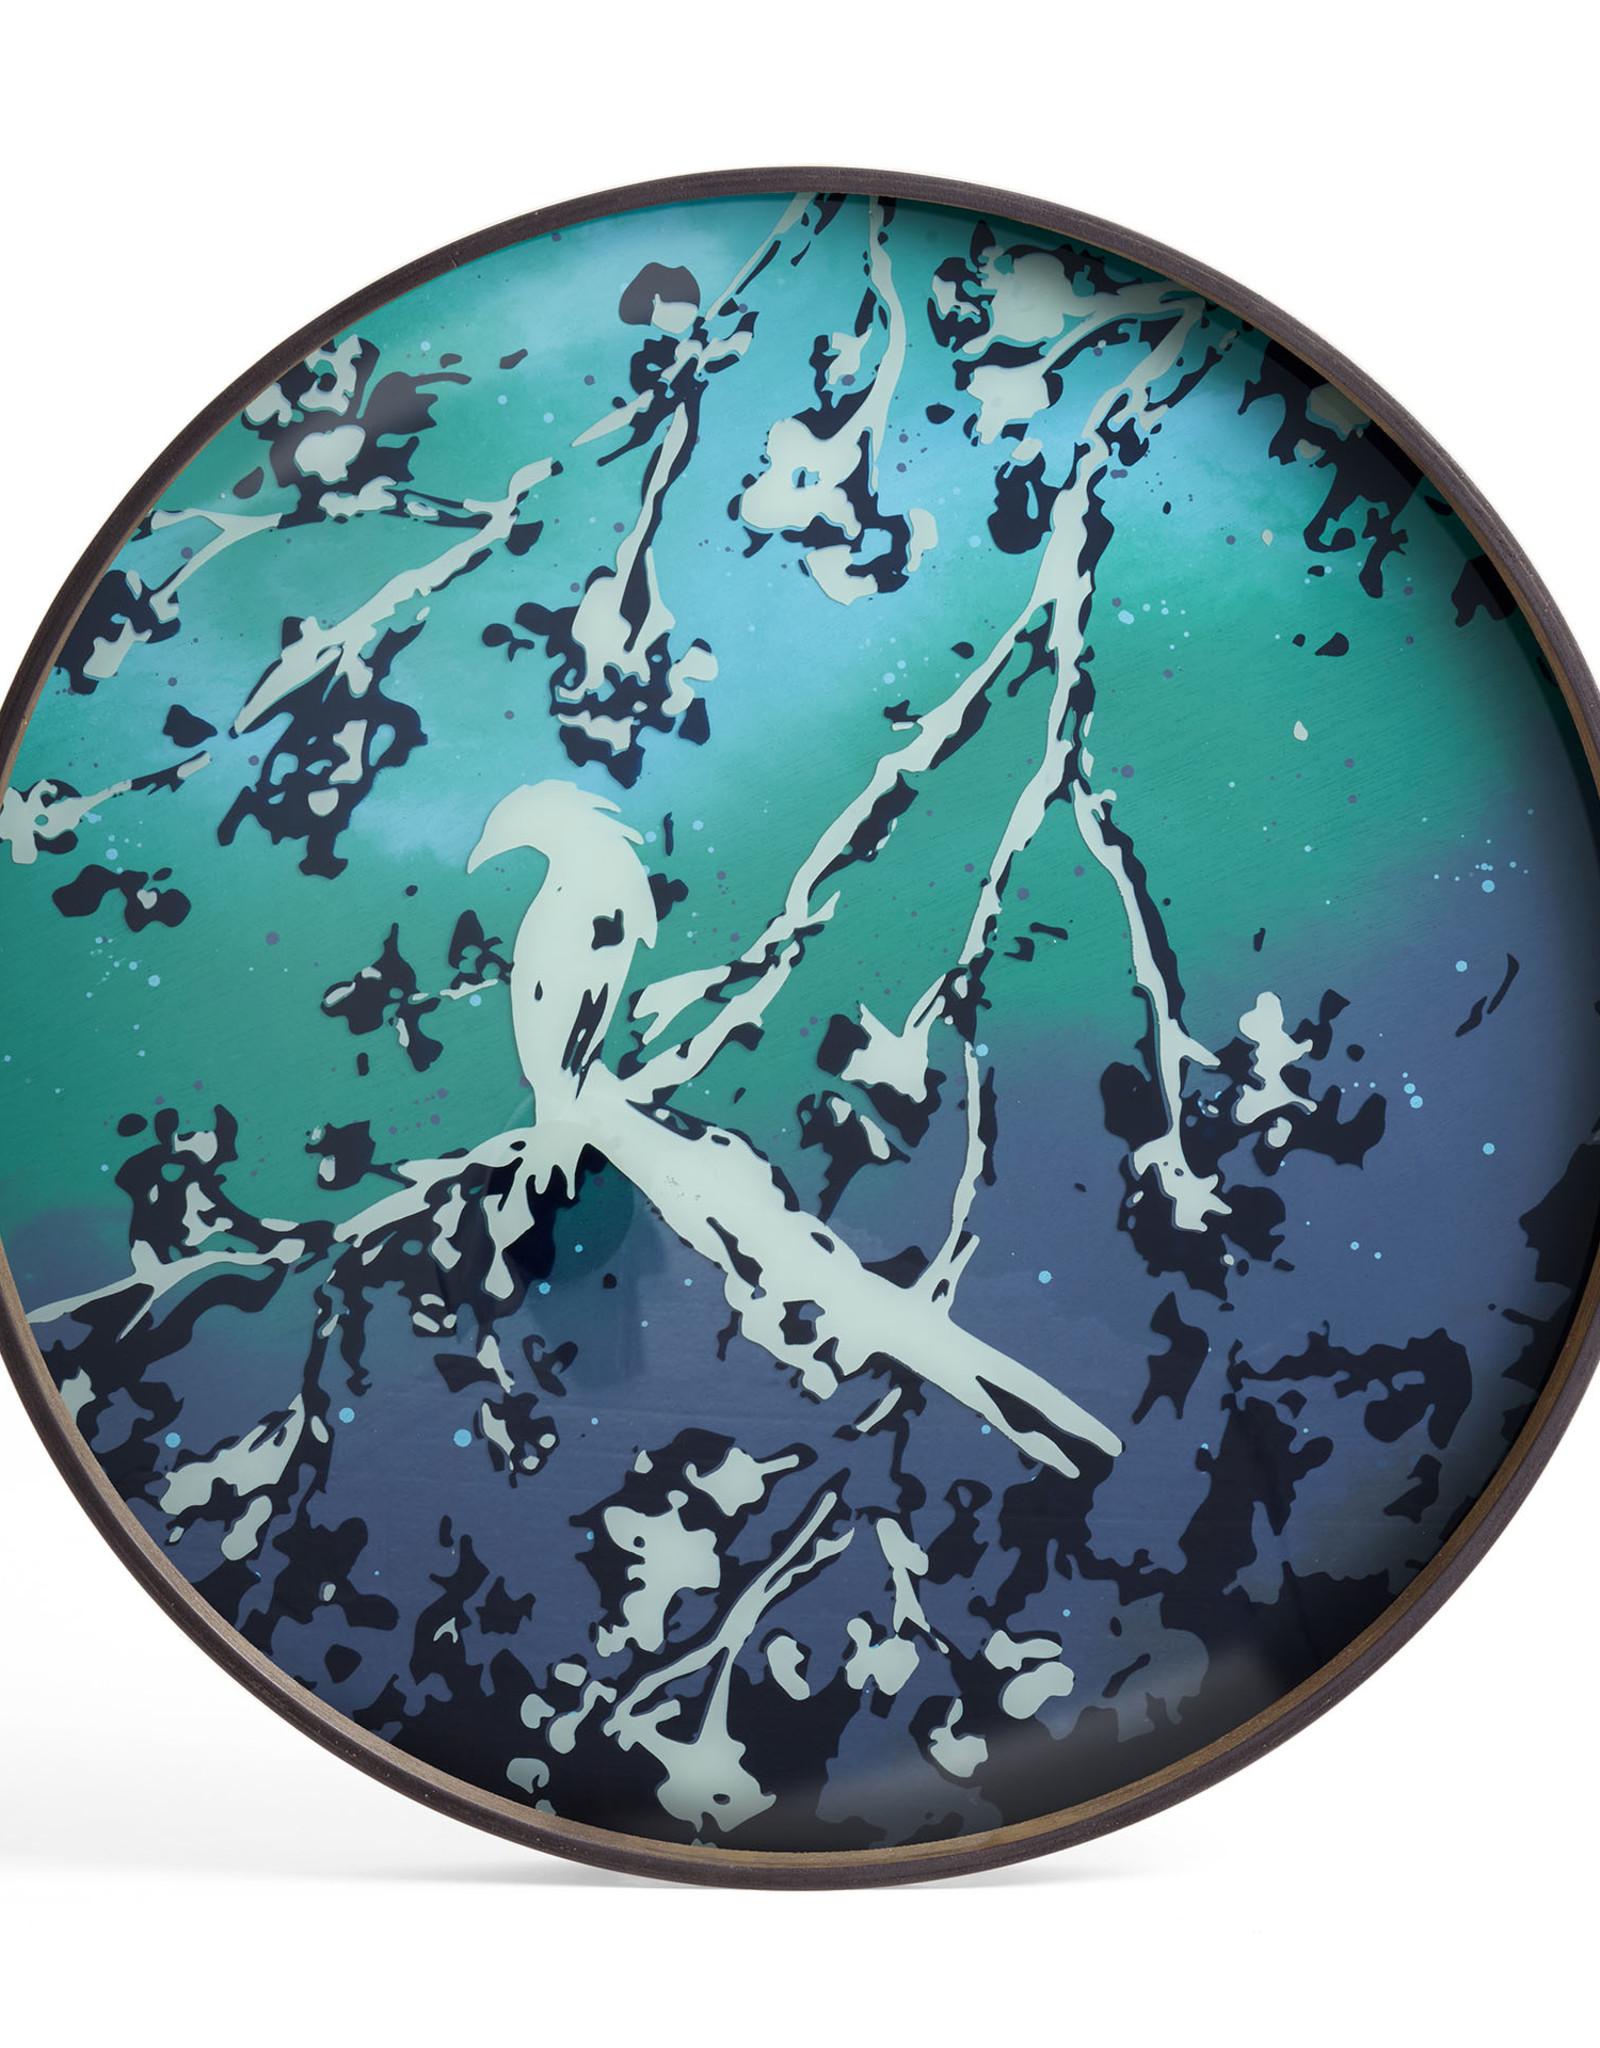 Birds of Paradise glass tray - round - L 24 x 24 x 2